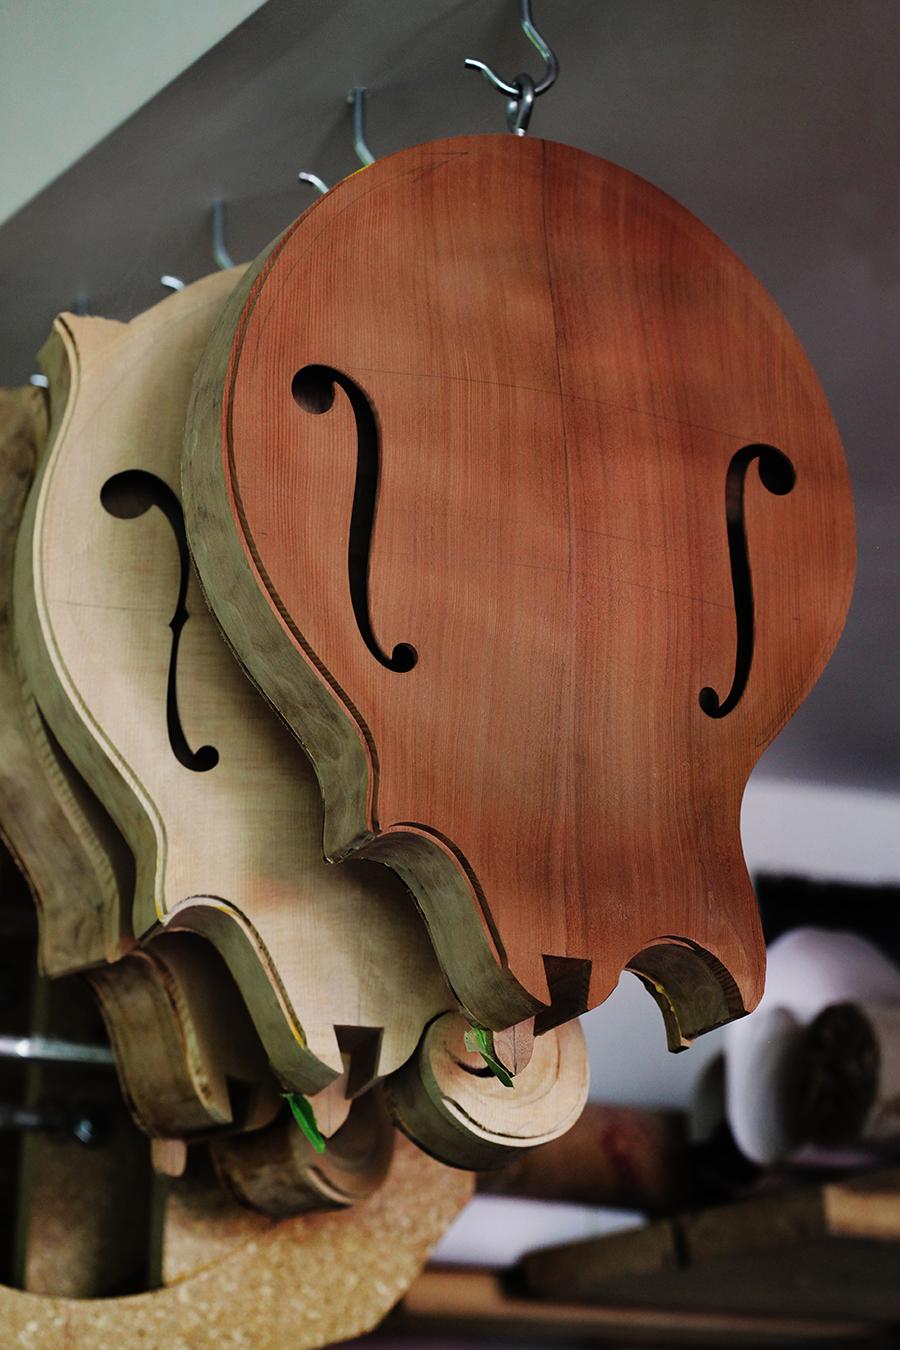 mandolins in progress, photo by hermon joyner.